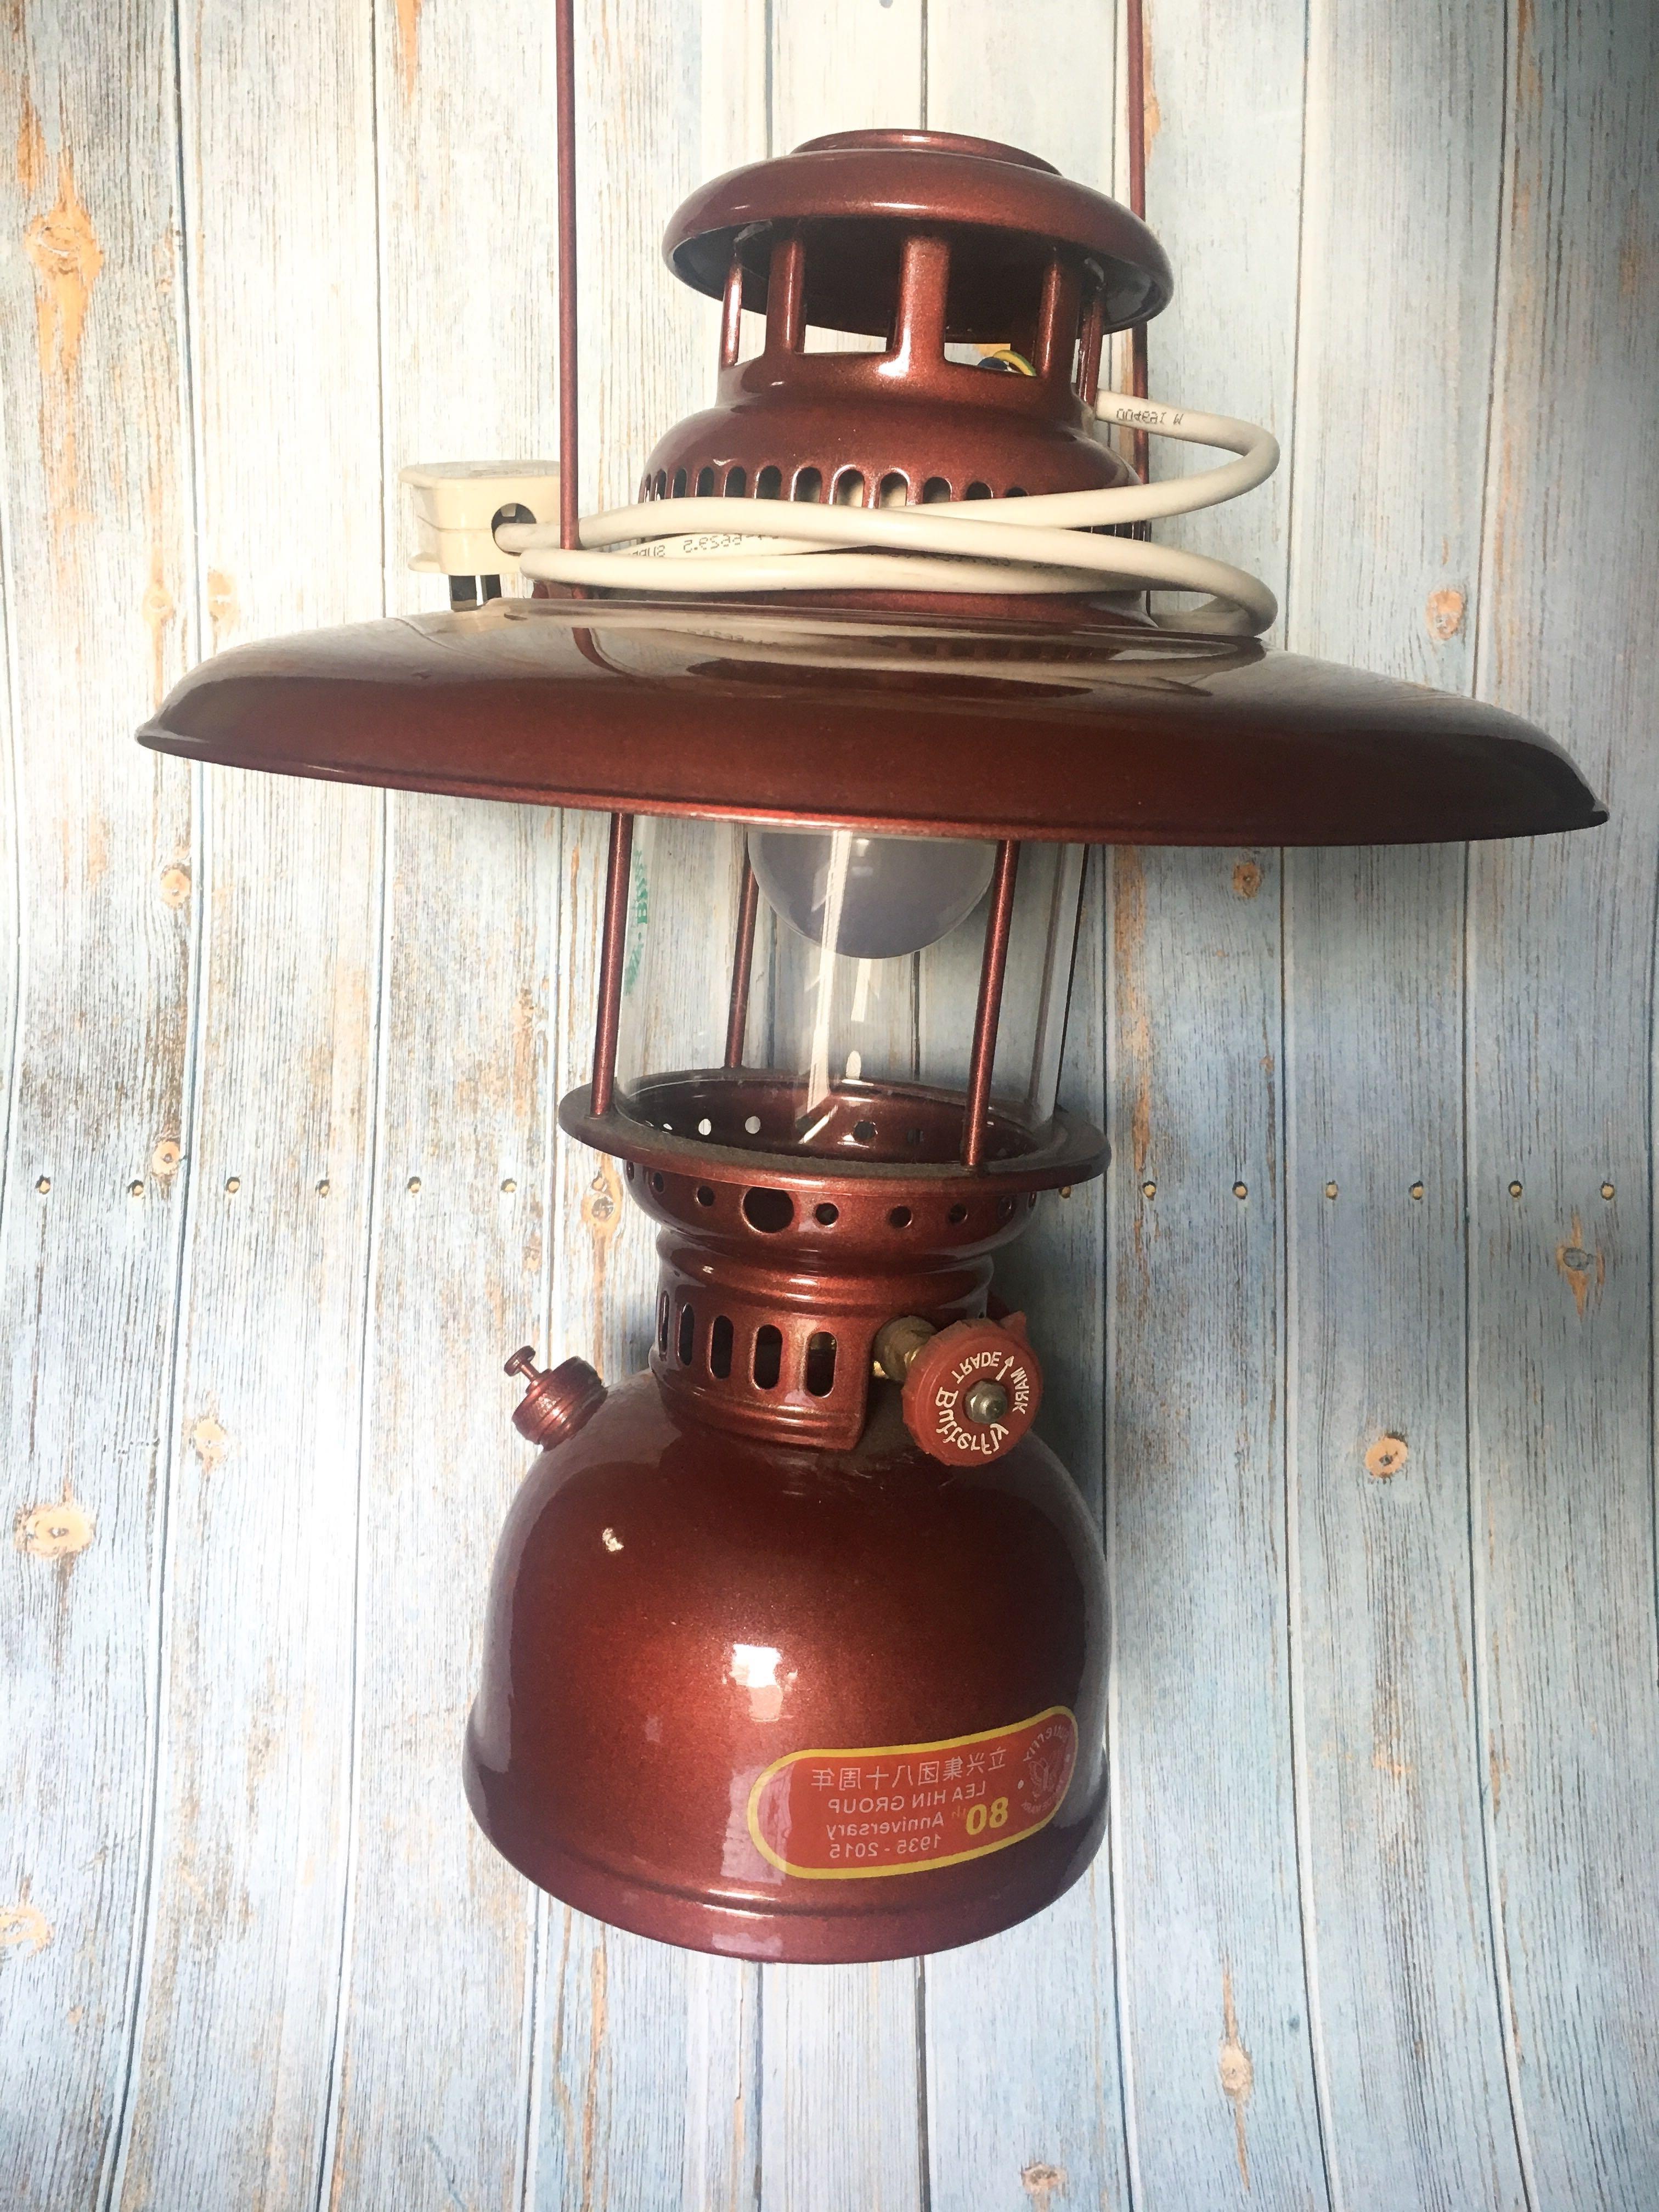 Trendy Can Nego* Vintage Kerosene Lamp Maroon Antique With Led Light Bulb Pertaining To Decorative Outdoor Kerosene Lanterns (View 18 of 20)